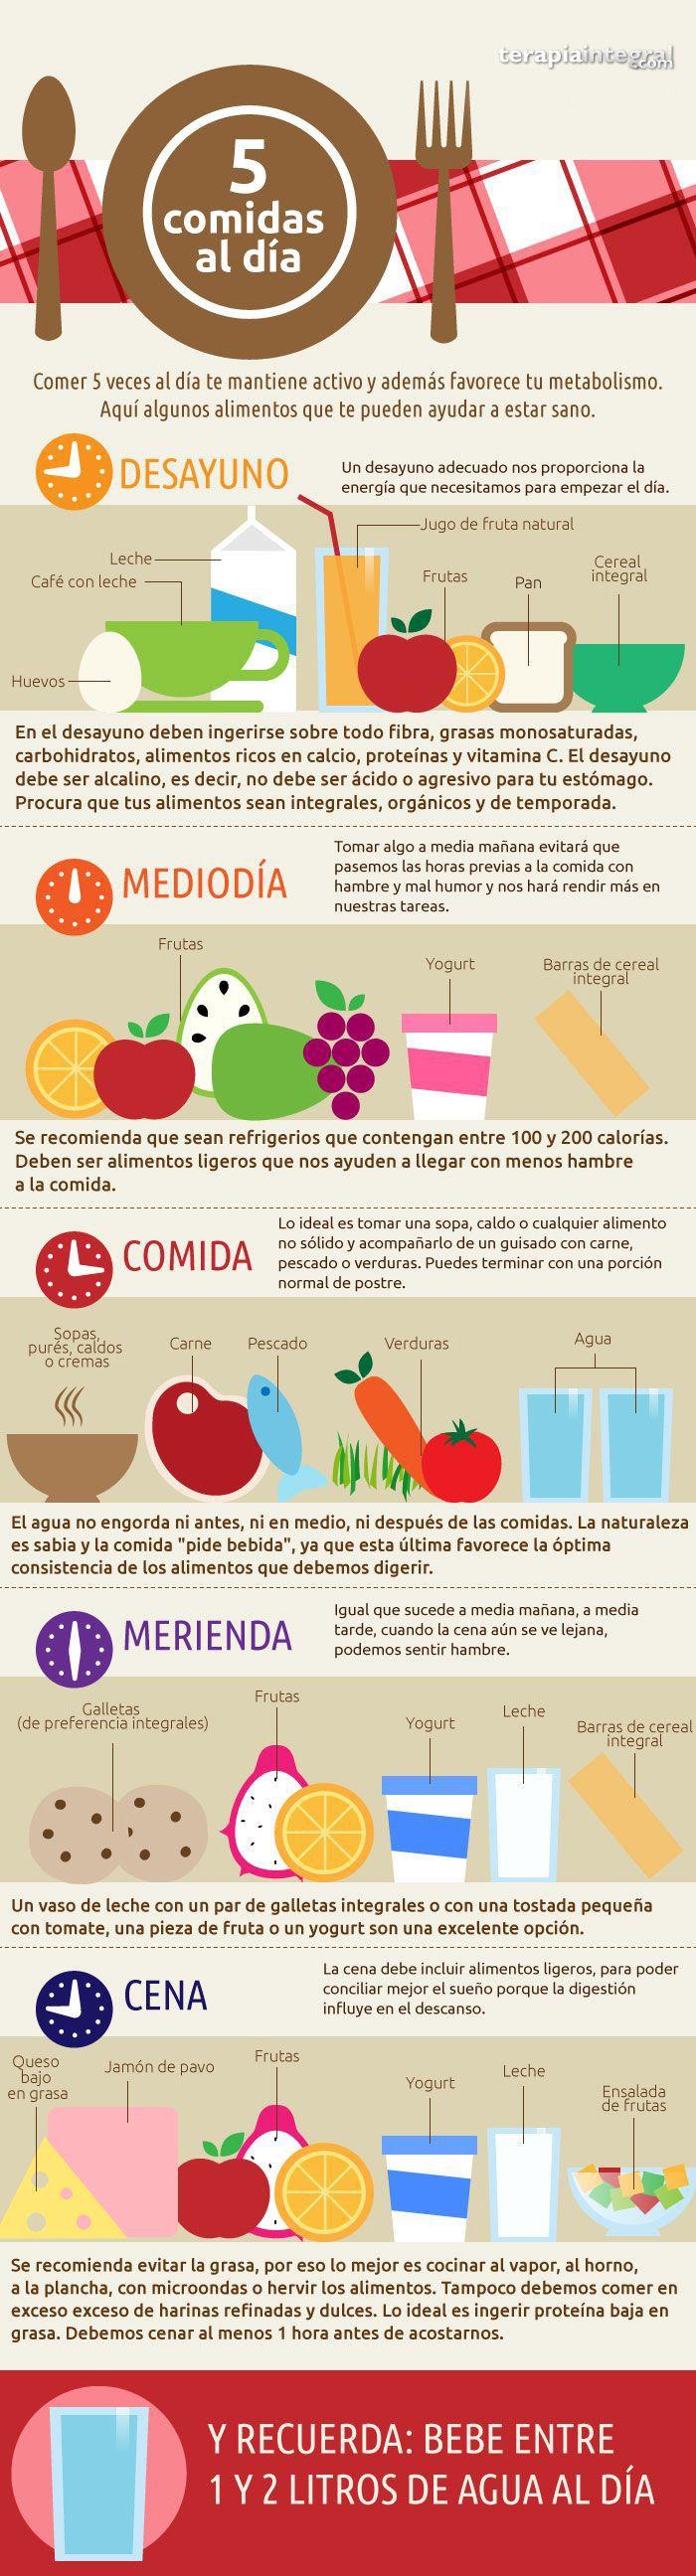 5 Comidas sanas